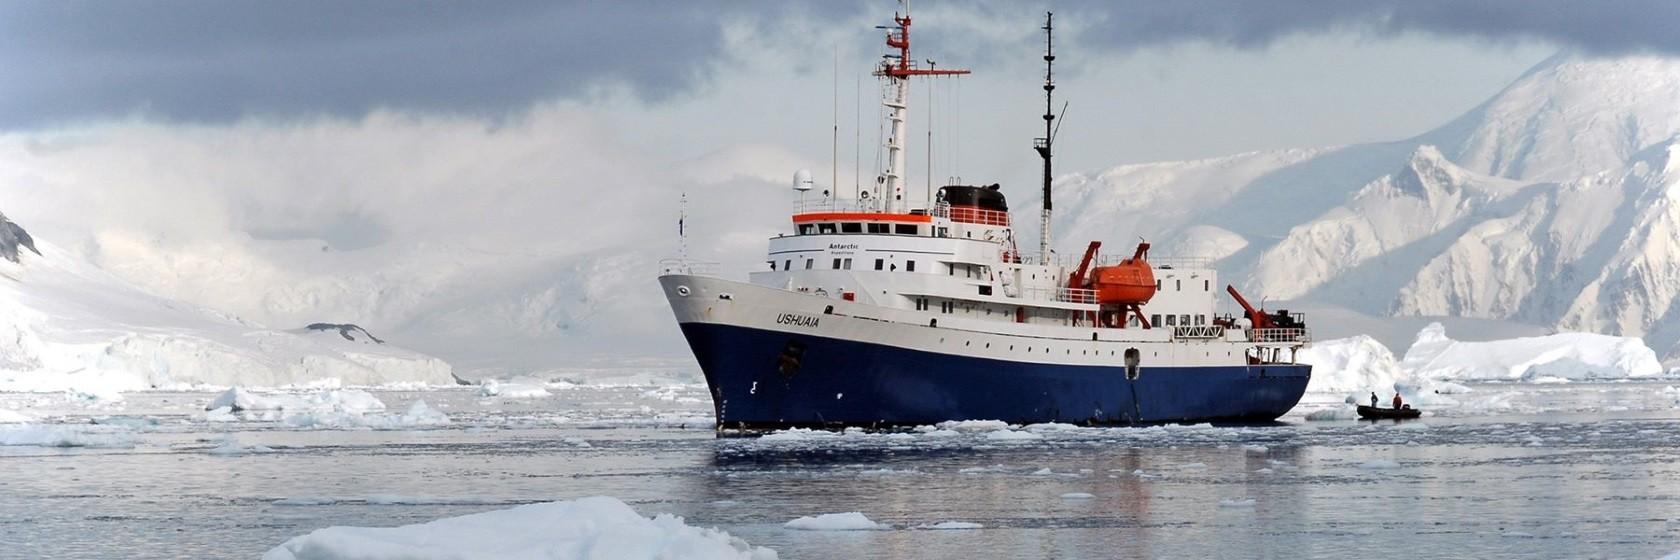 ushuaia_polar_cruise-8bc6362abe